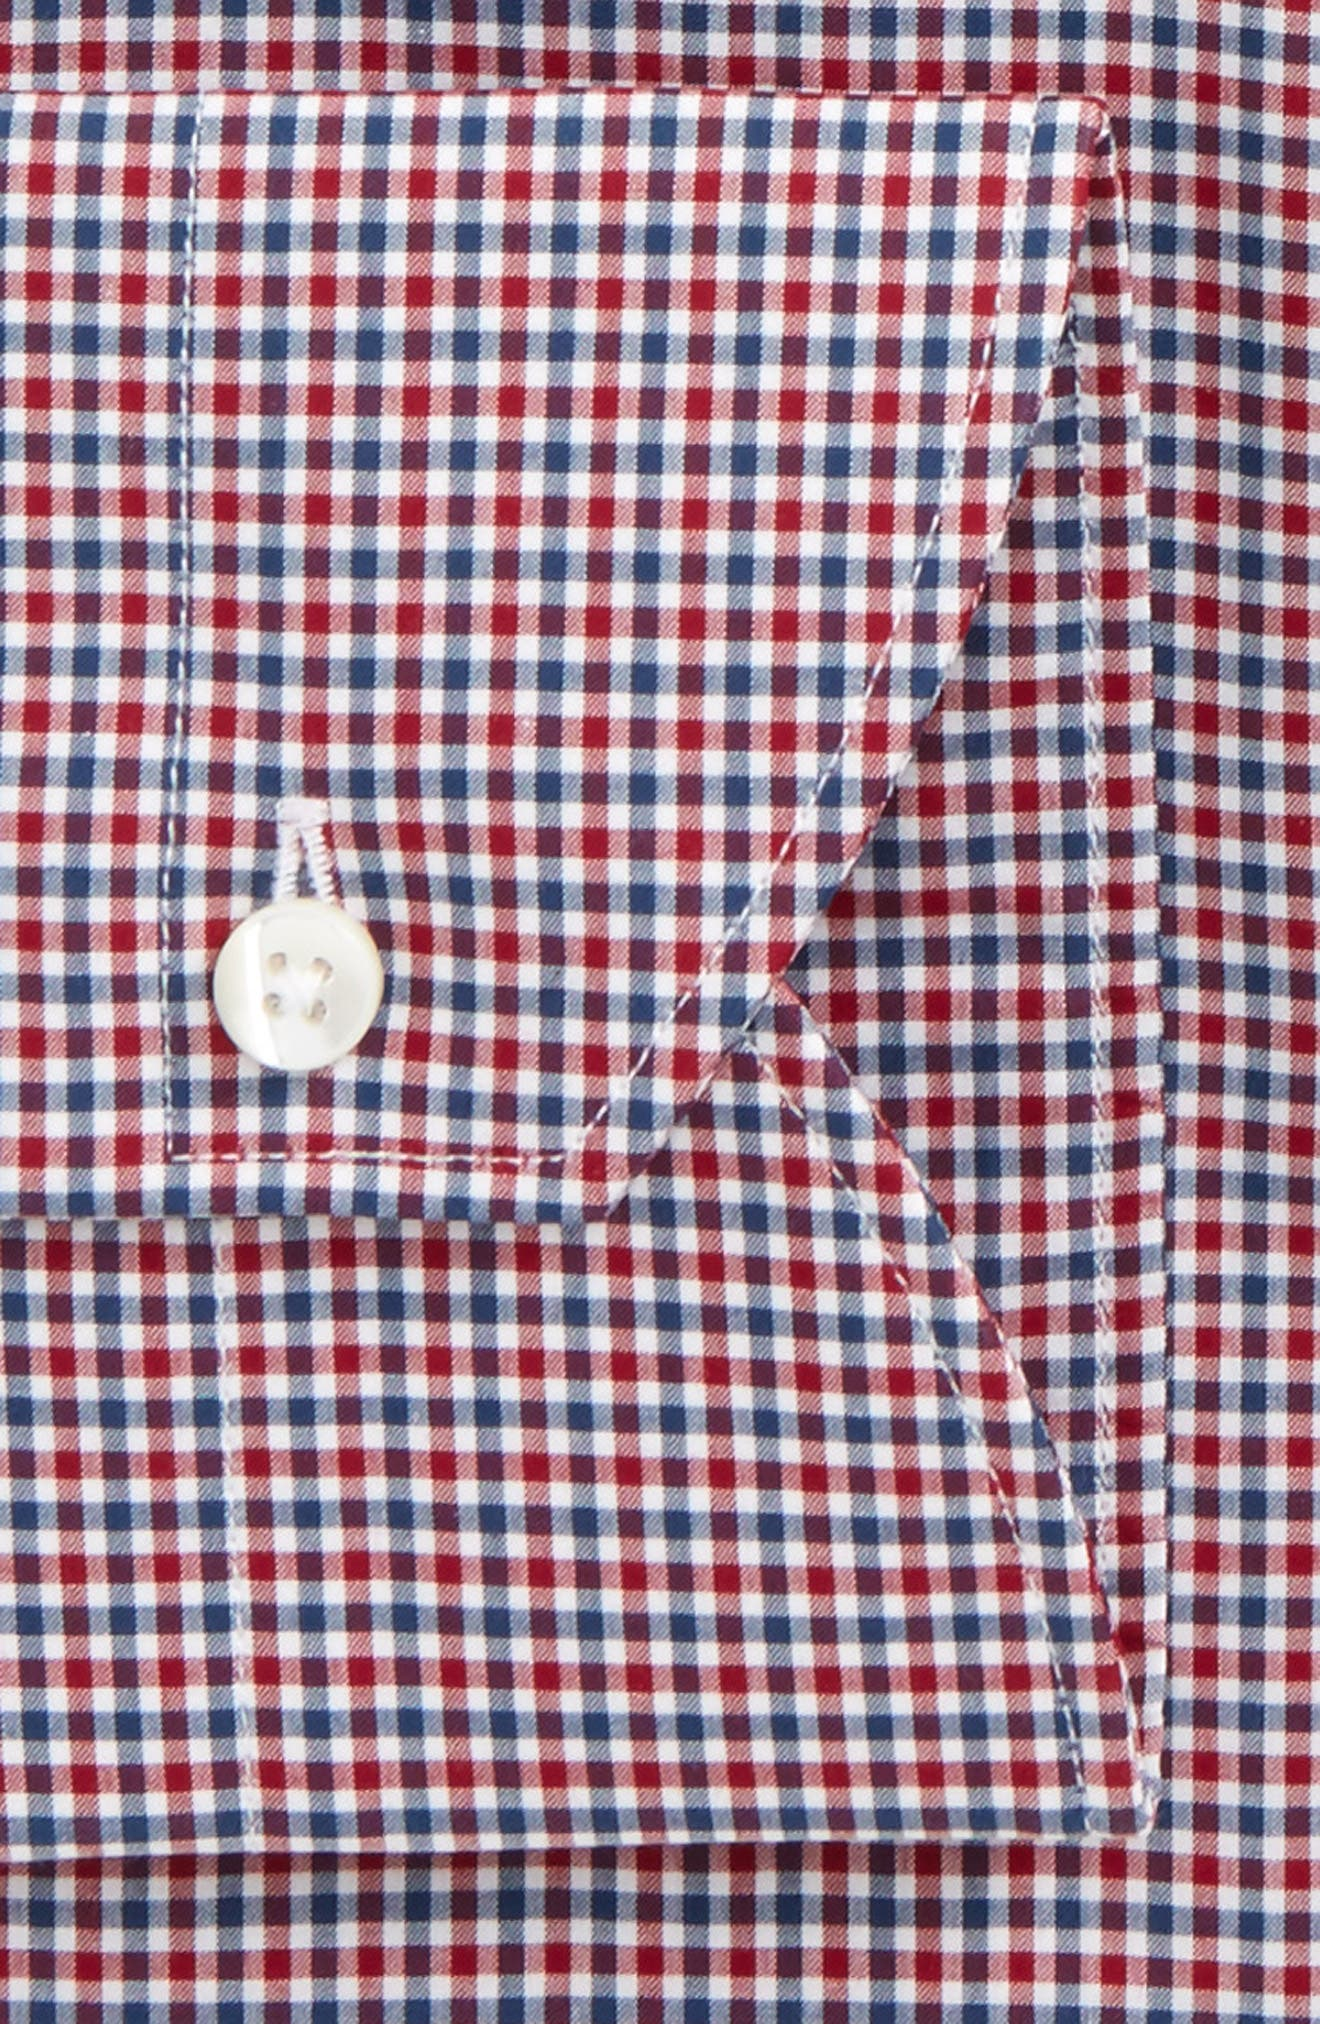 Regular Fit Dress Shirt,                             Alternate thumbnail 2, color,                             Bright Red/ Blue